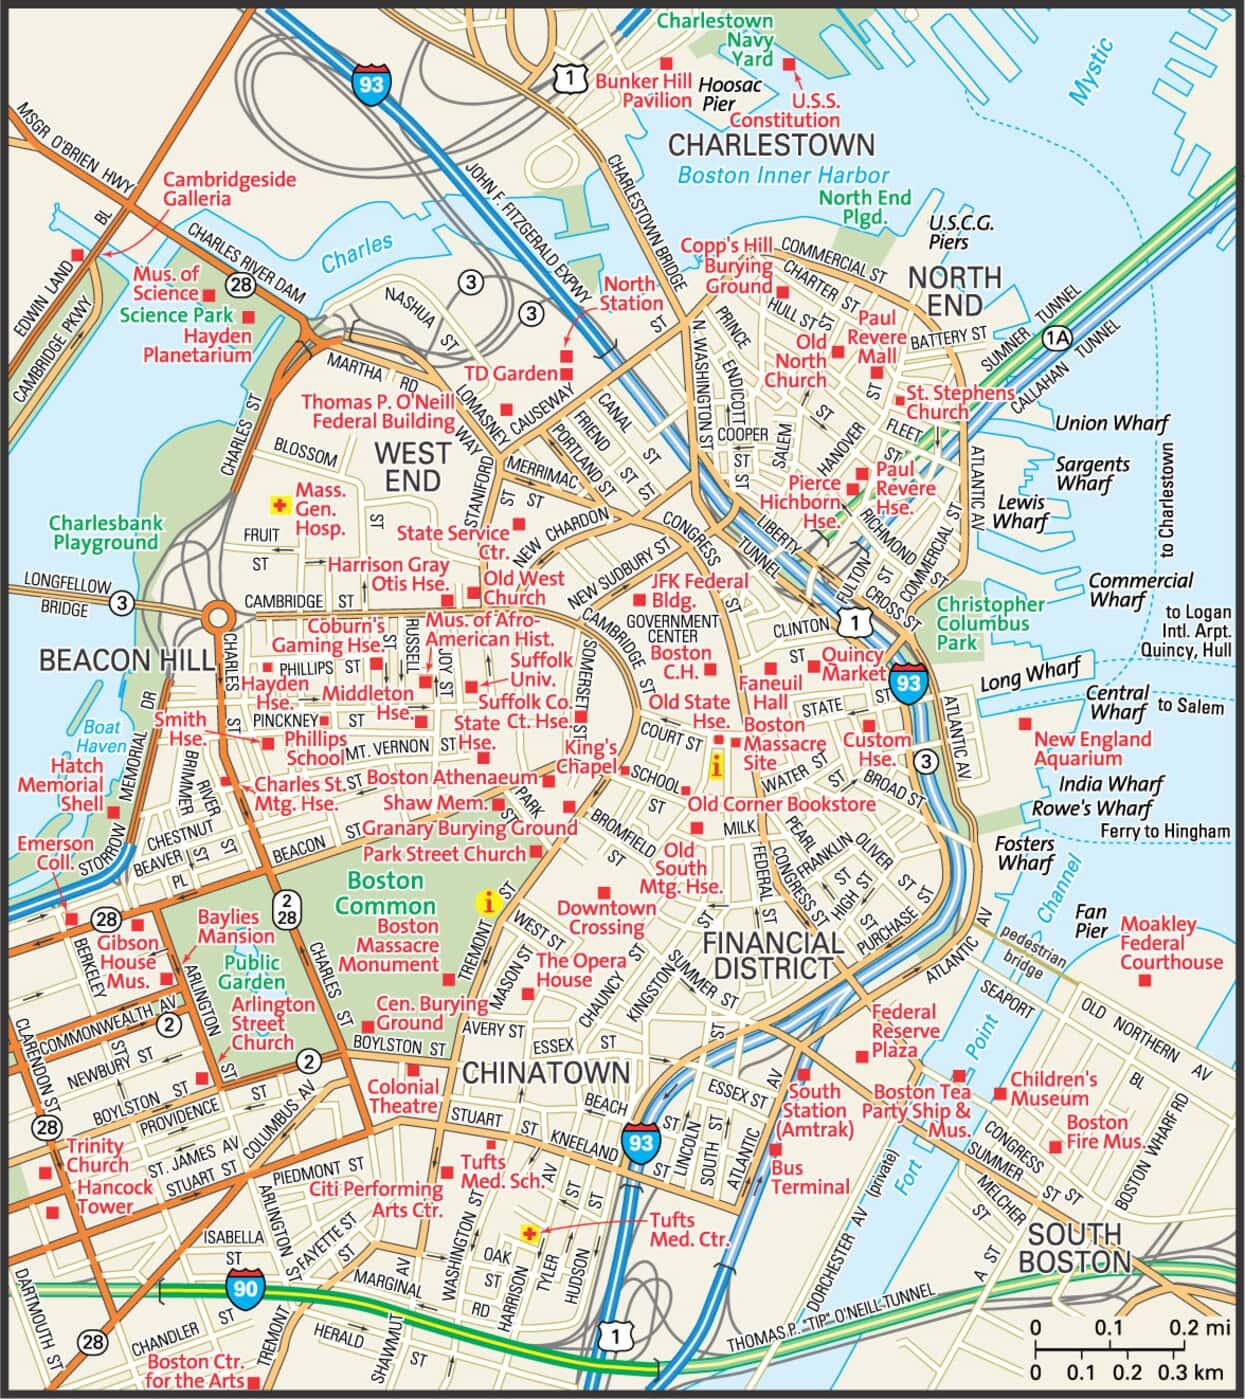 Boston Map Guide To Boston Massachusetts - Boston-on-map-of-us